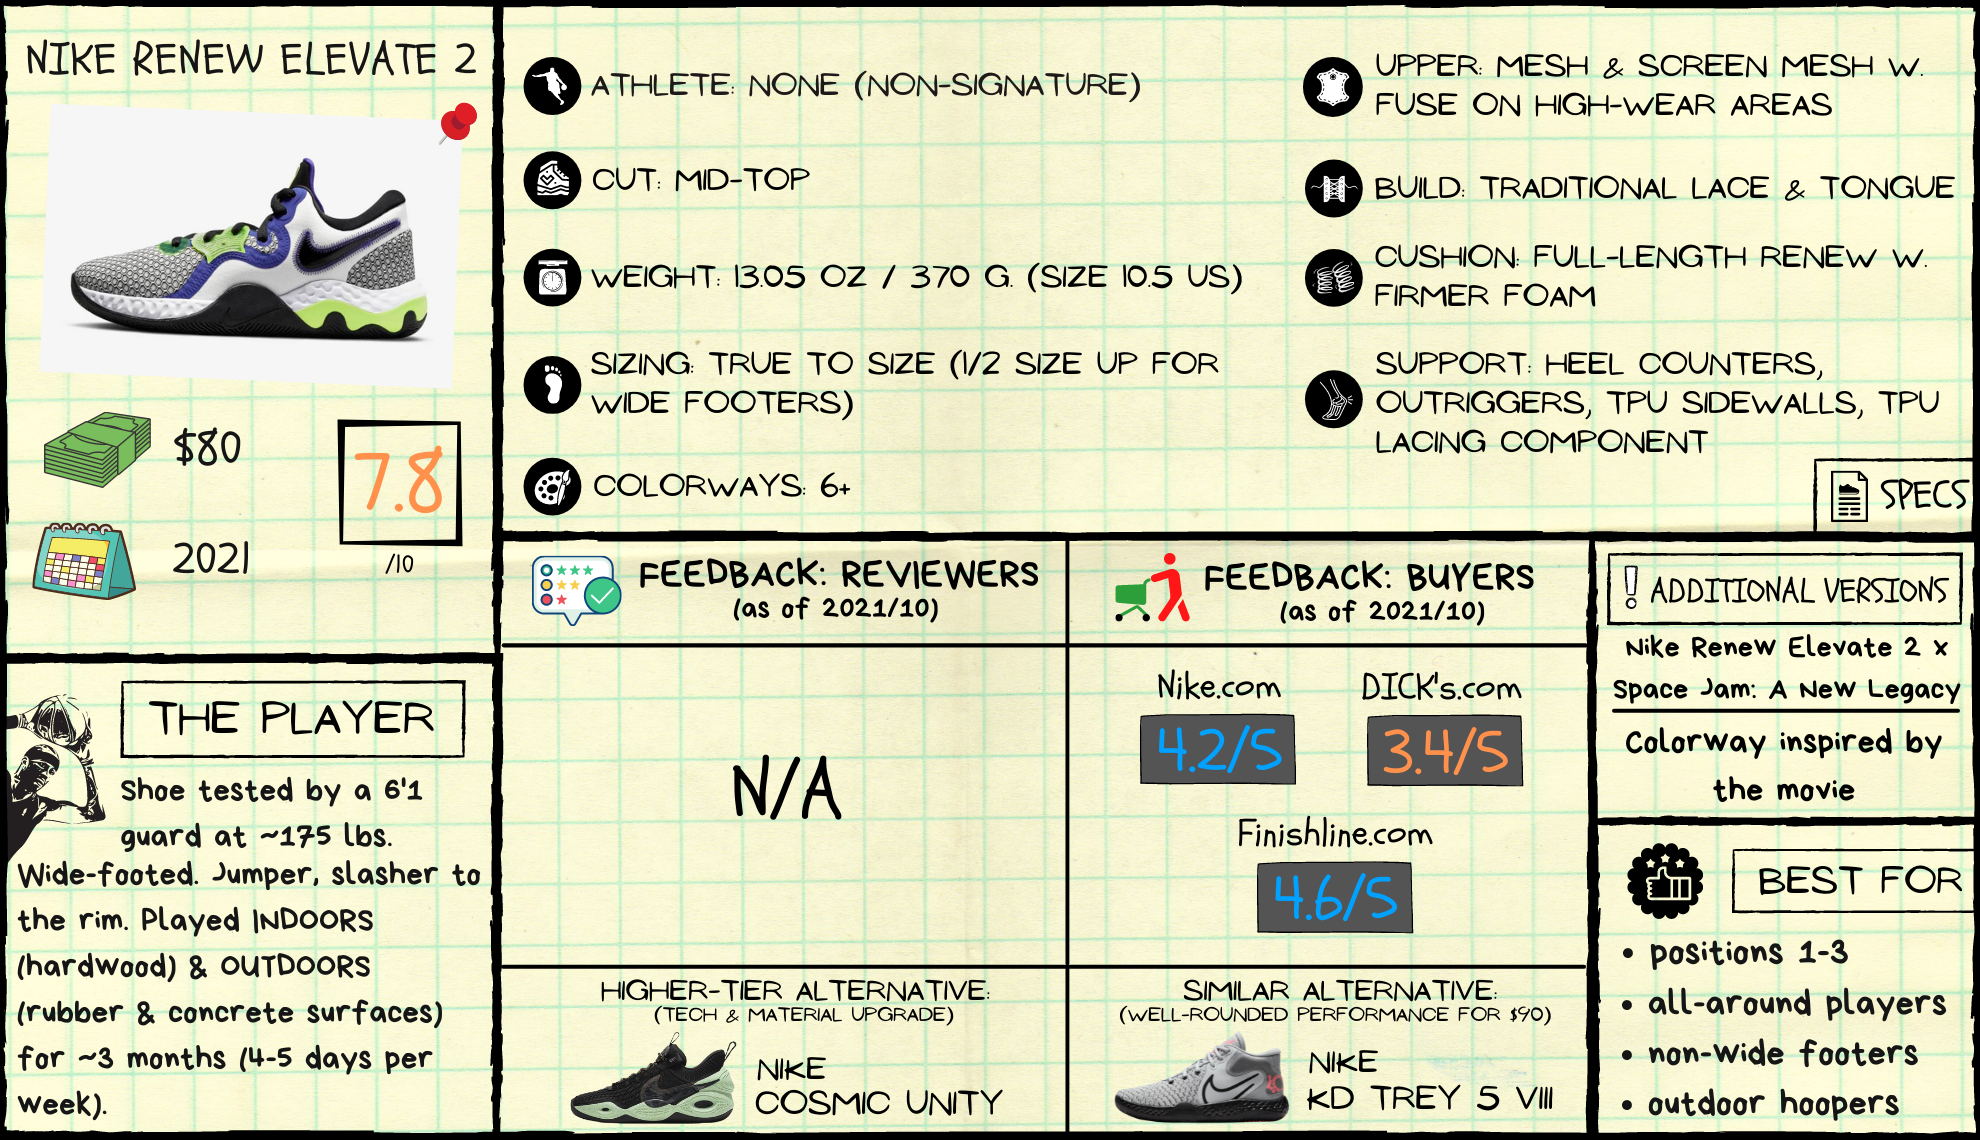 Nike Renew Elevate 2 Review: Spec Sheet